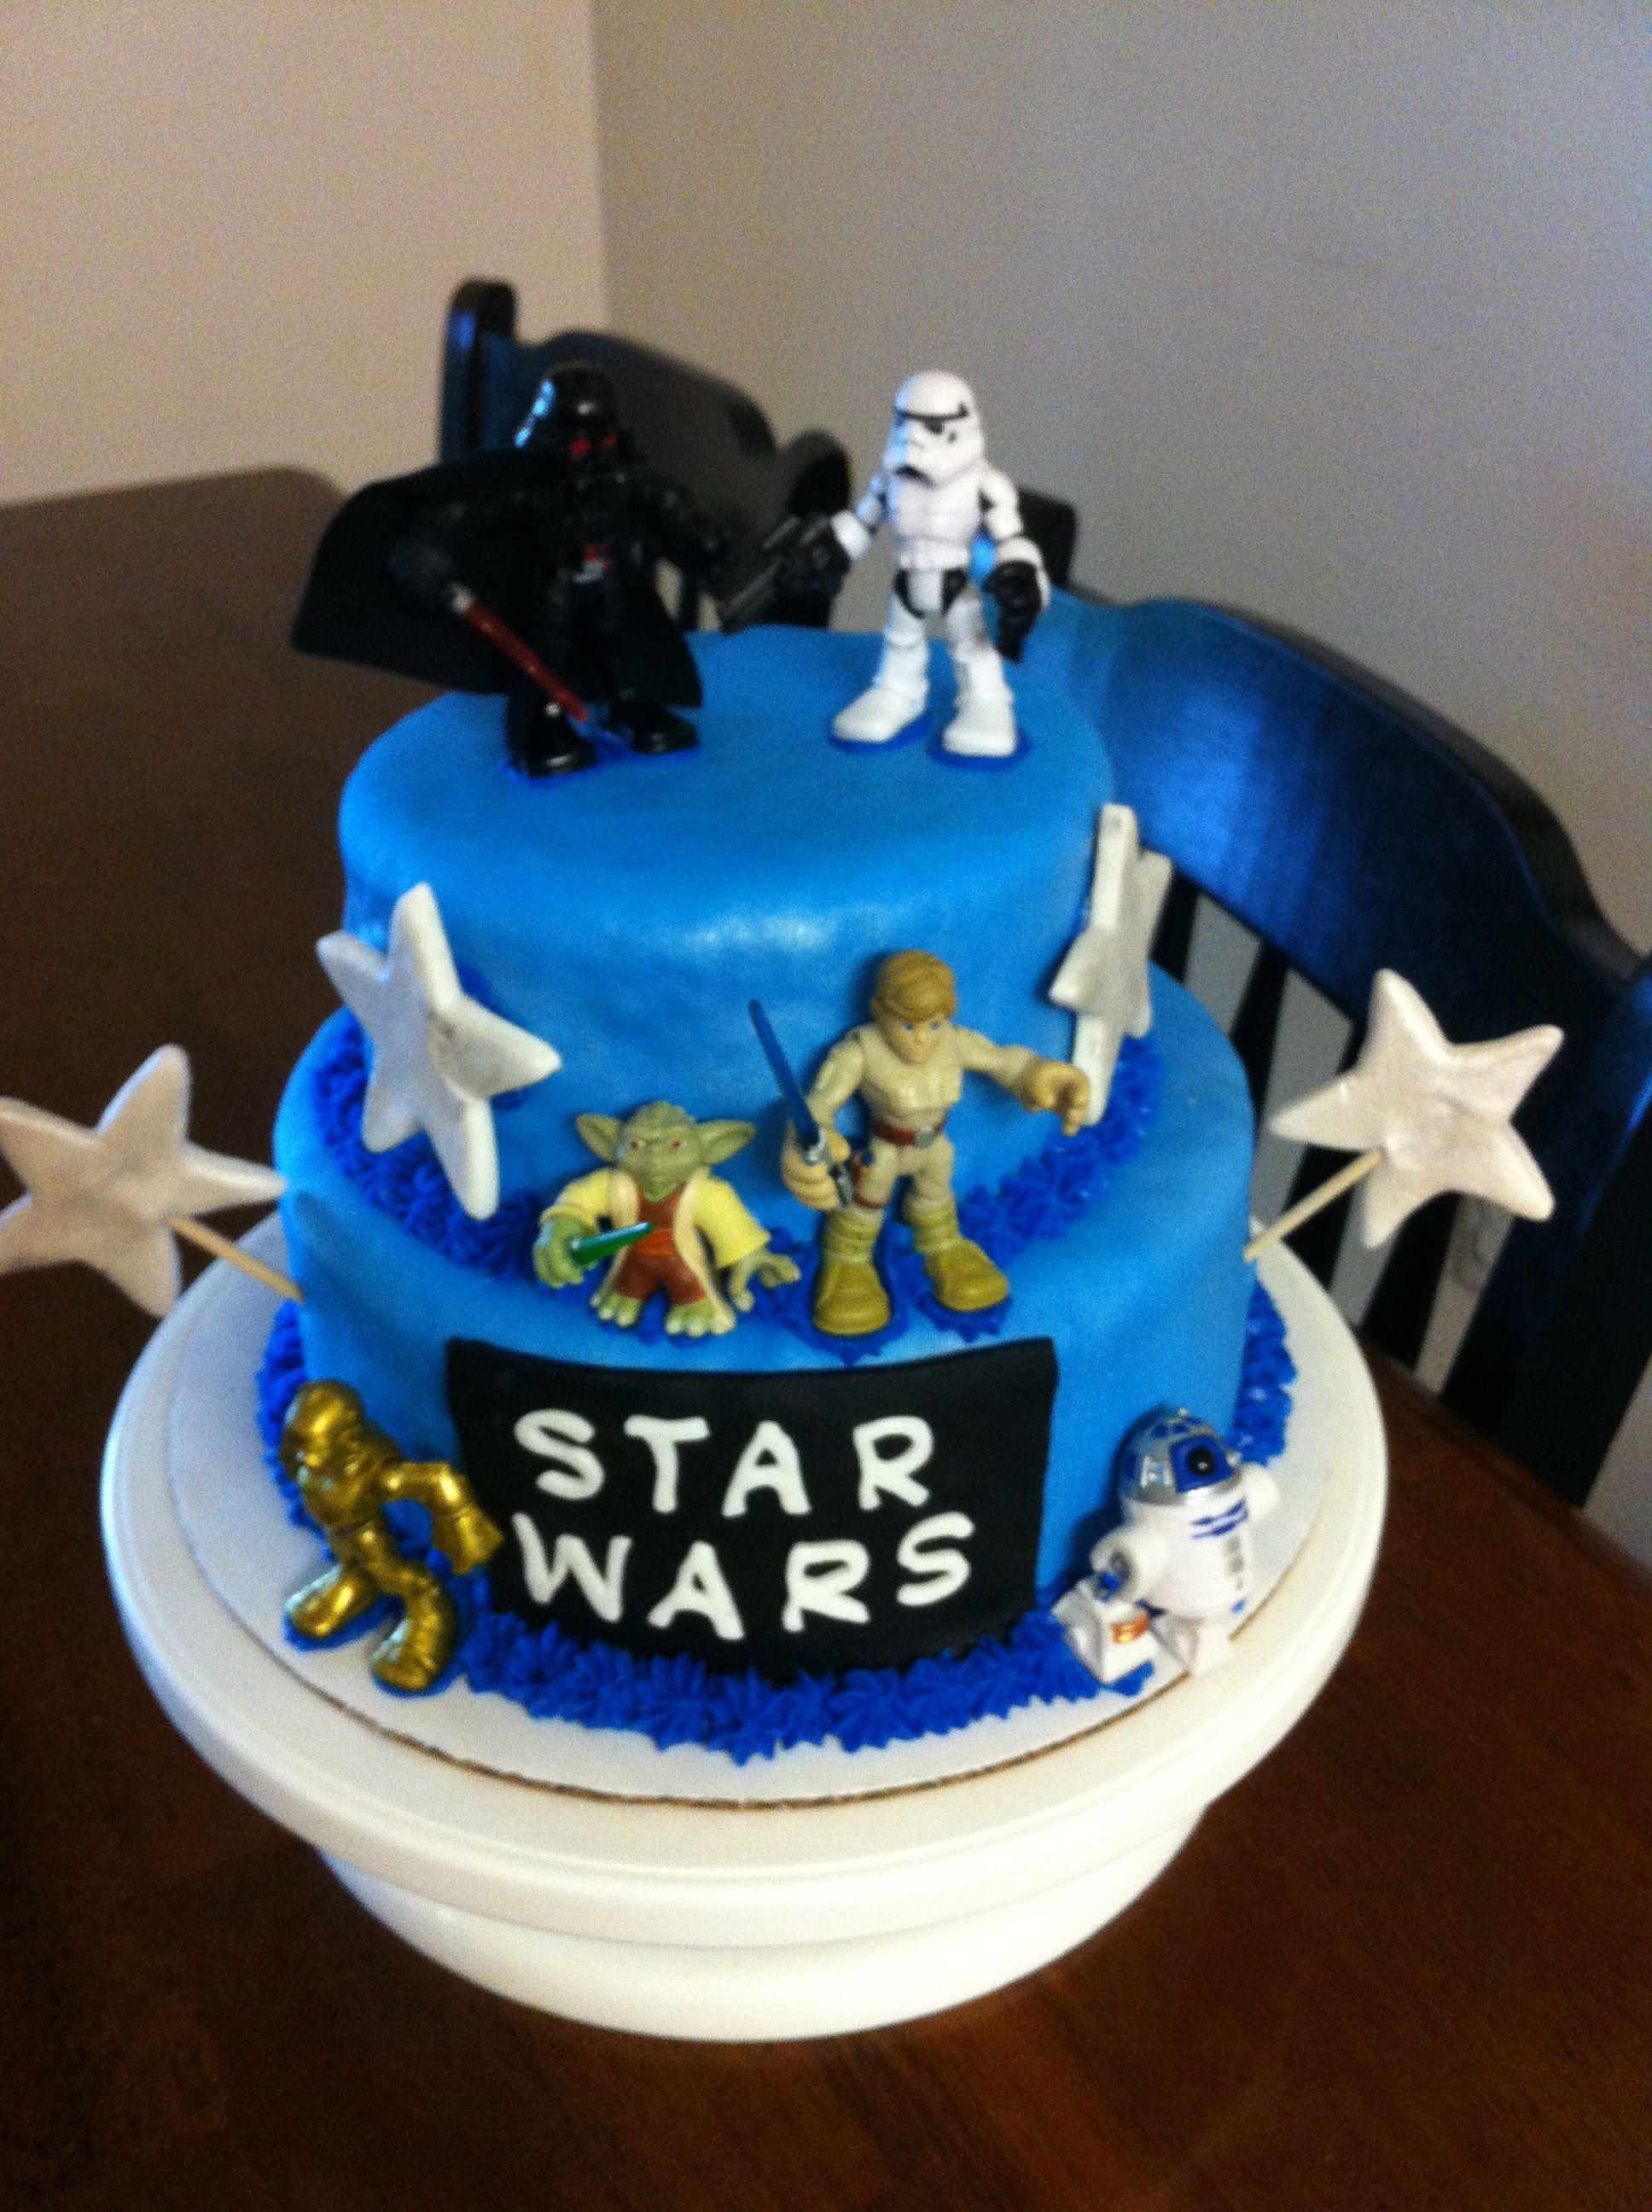 Star Wars Cake Design Pinterest : Star Wars Birthday Cakes Pinterest